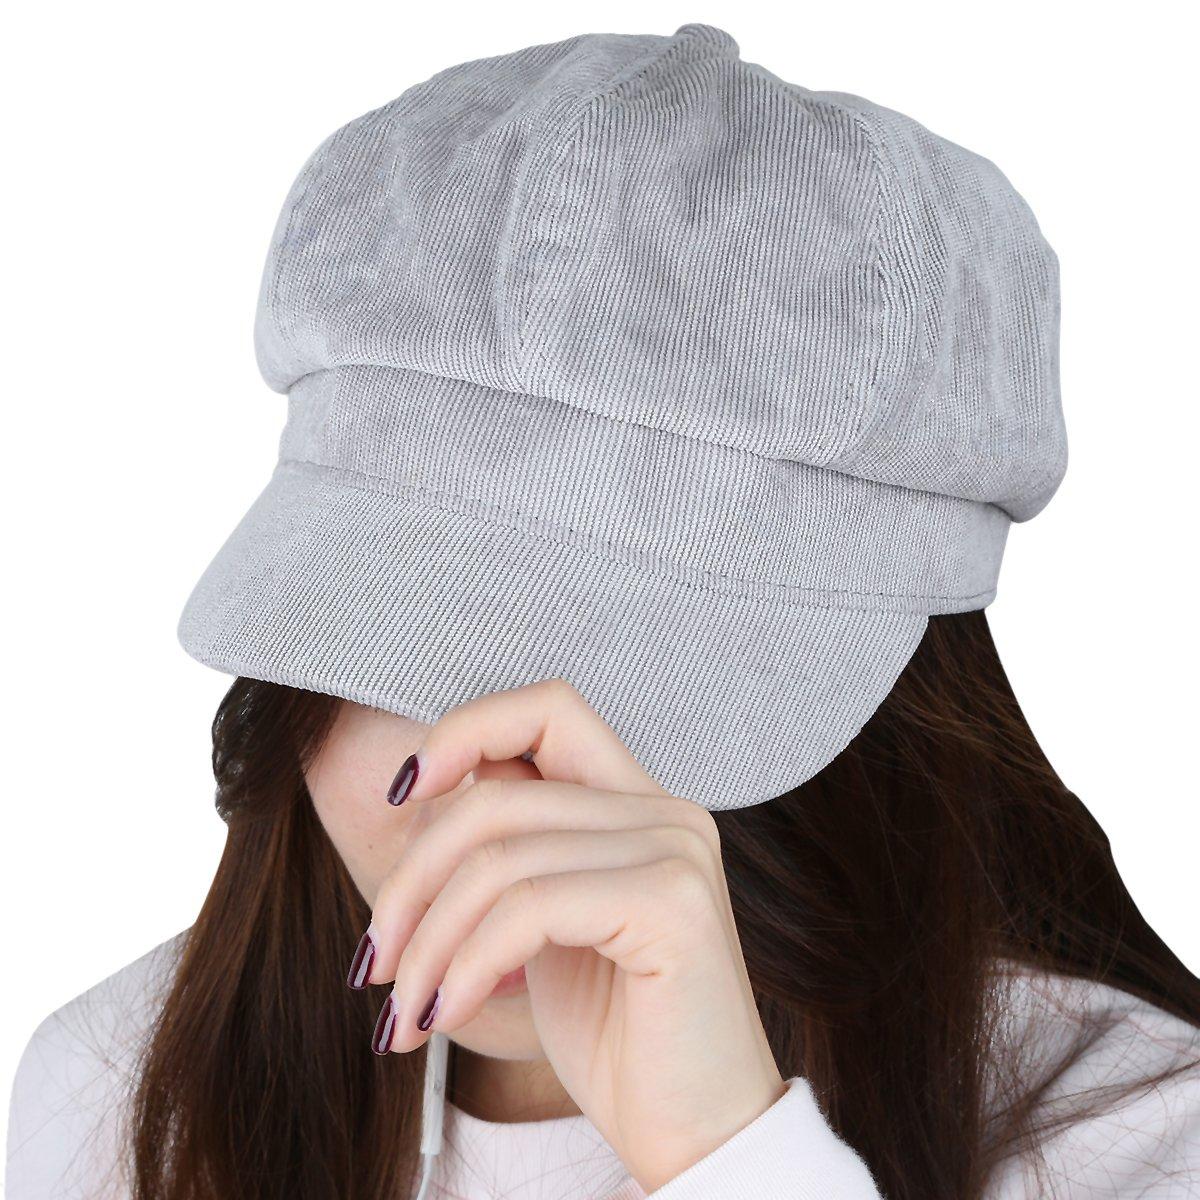 Samtree newsboy Cap For Women,8 Panel IVY Cabbie Beret Visor Brim Hat(Light Grey(Corduroy))